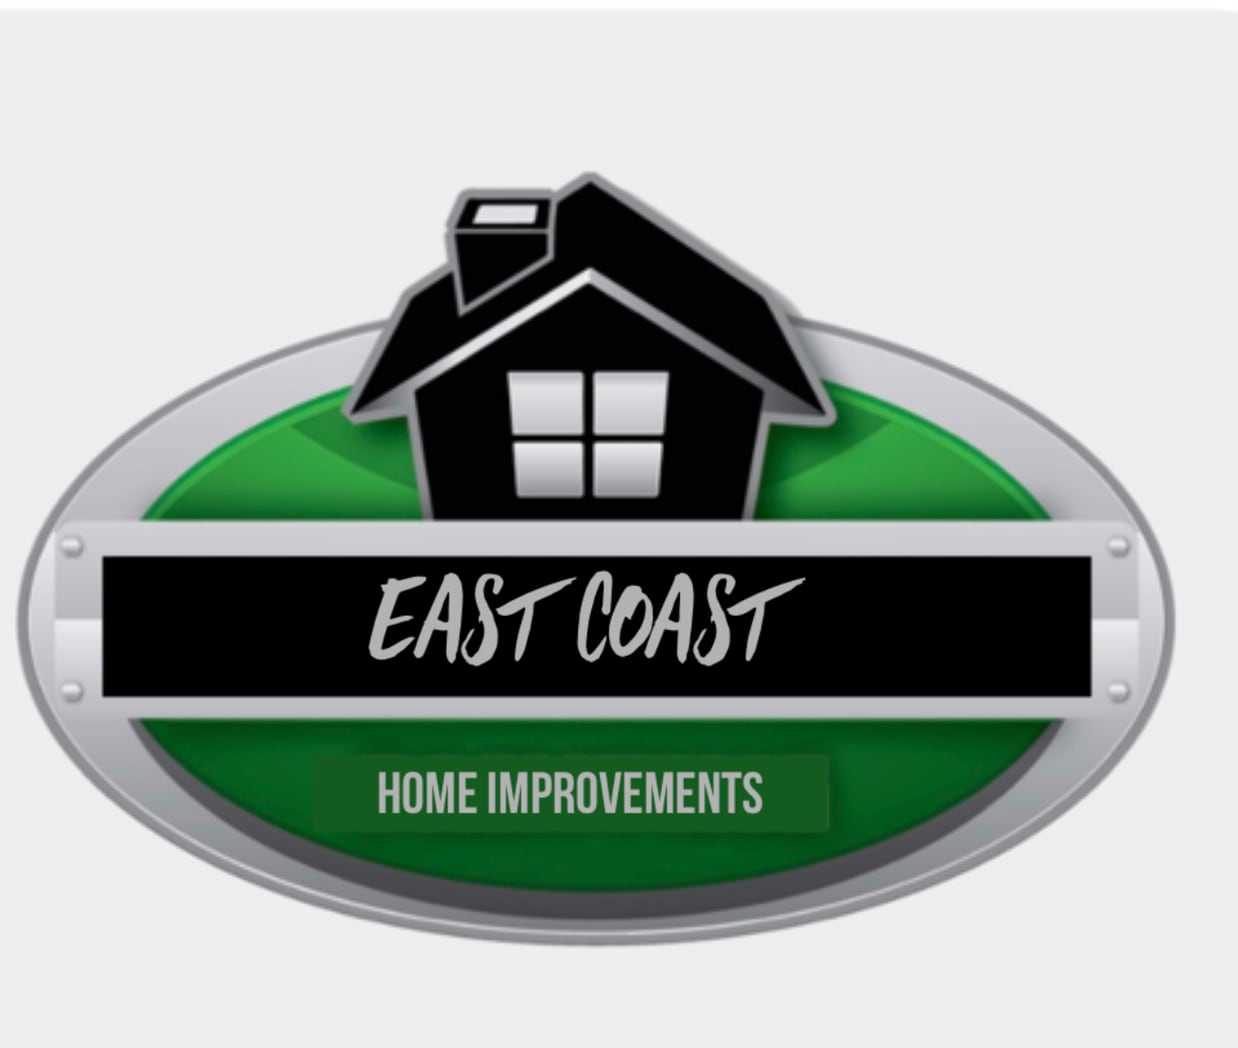 East Coast Home Improvements